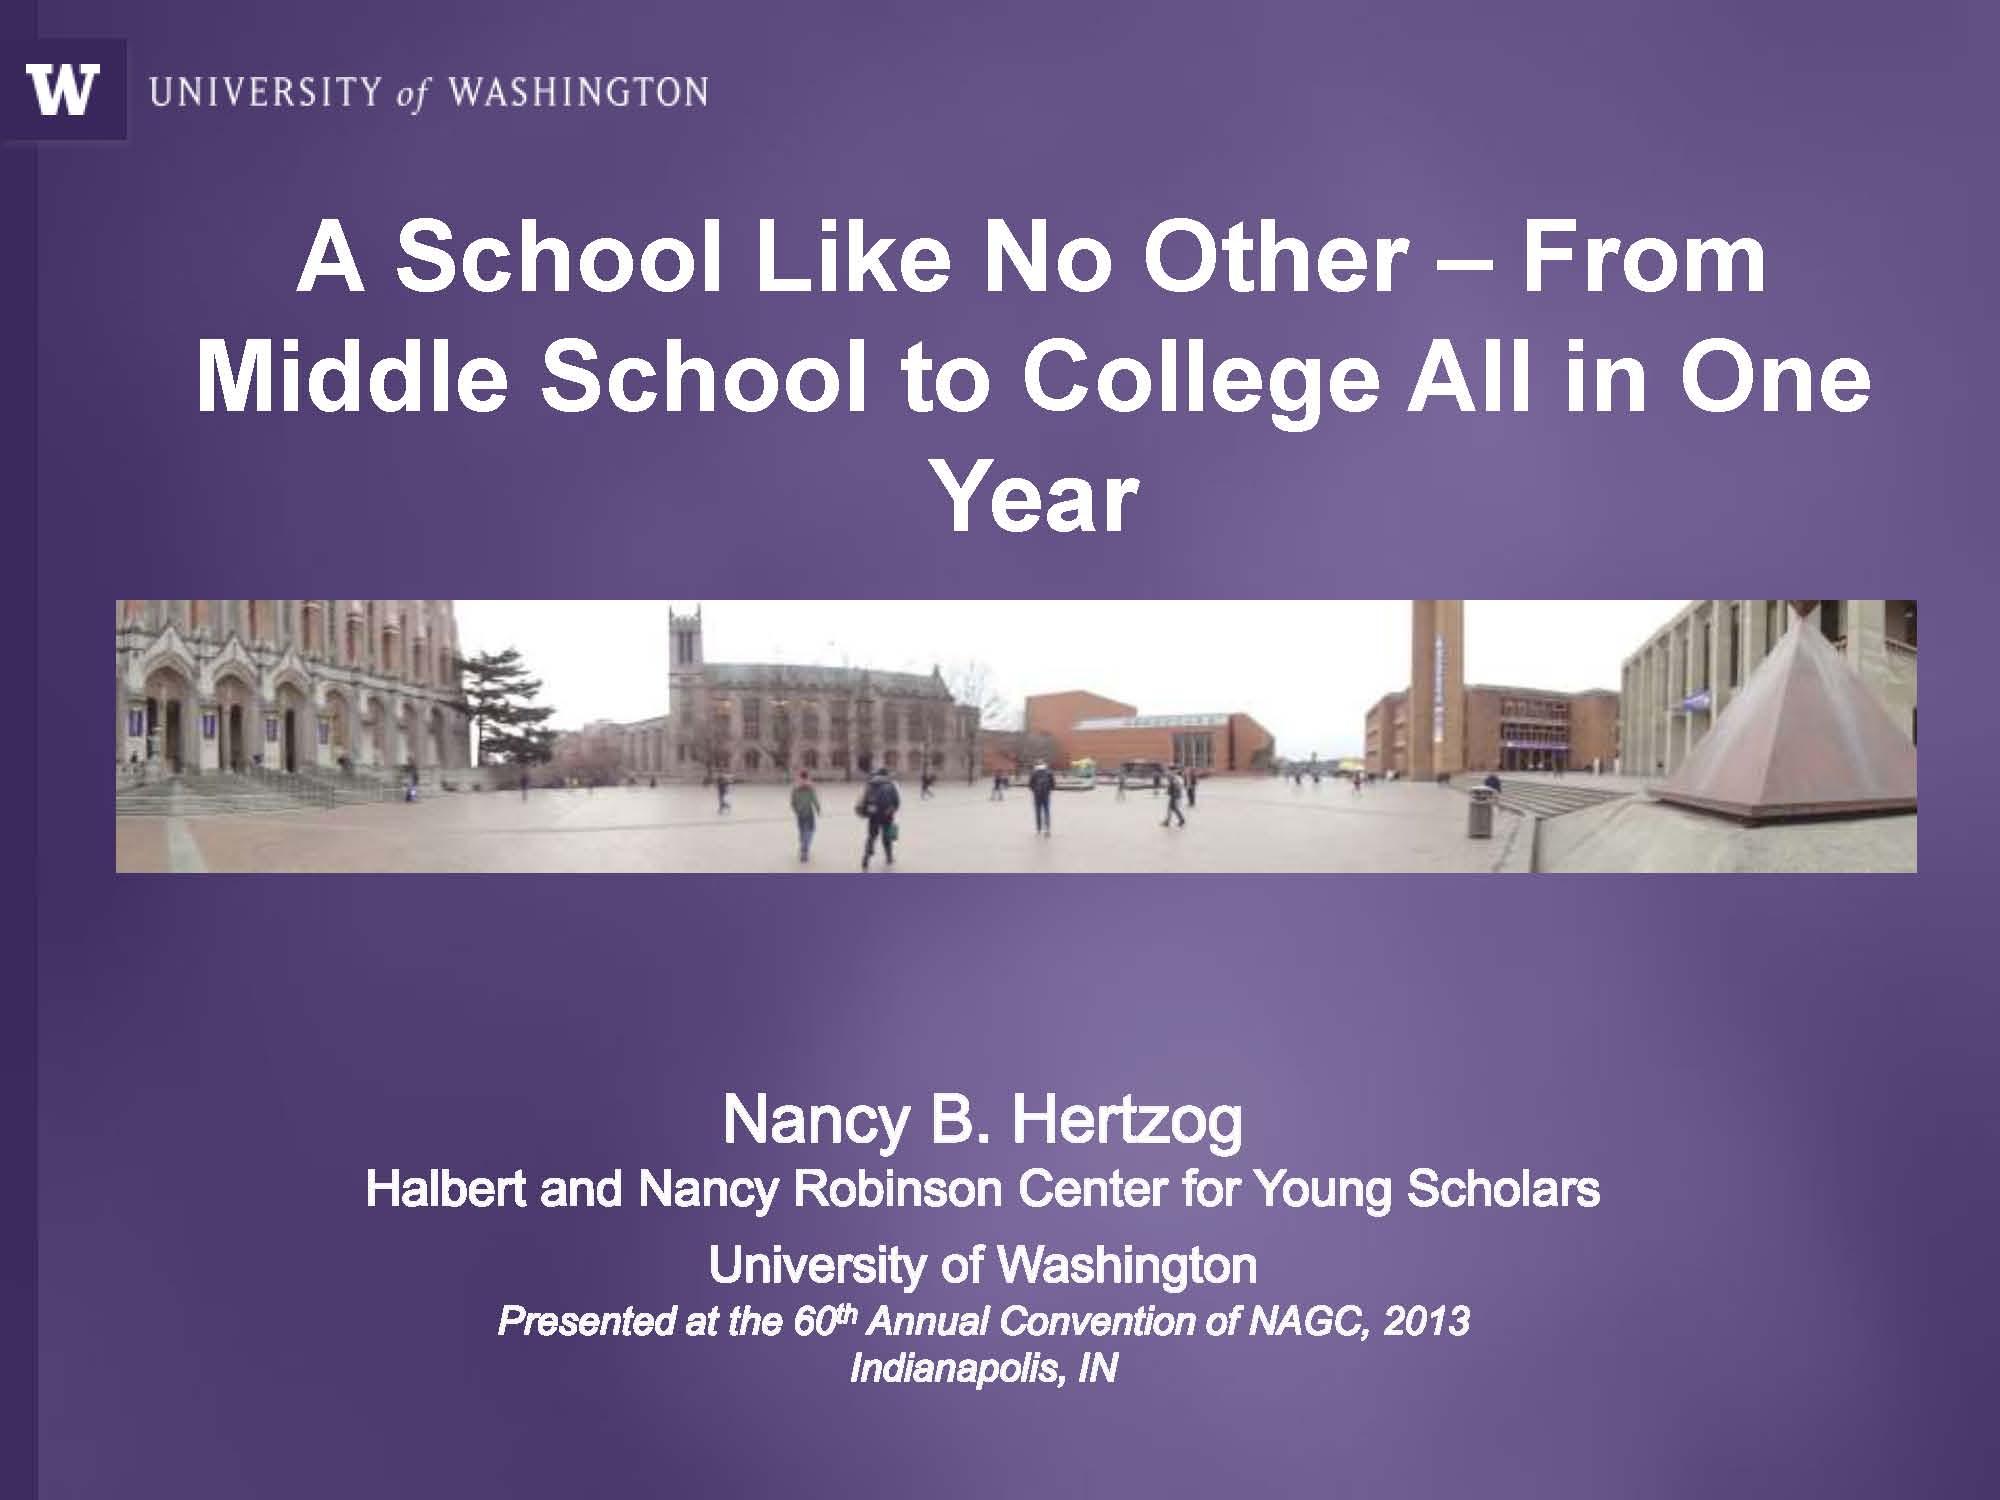 NAGC2013ASchoolLikeNoOther